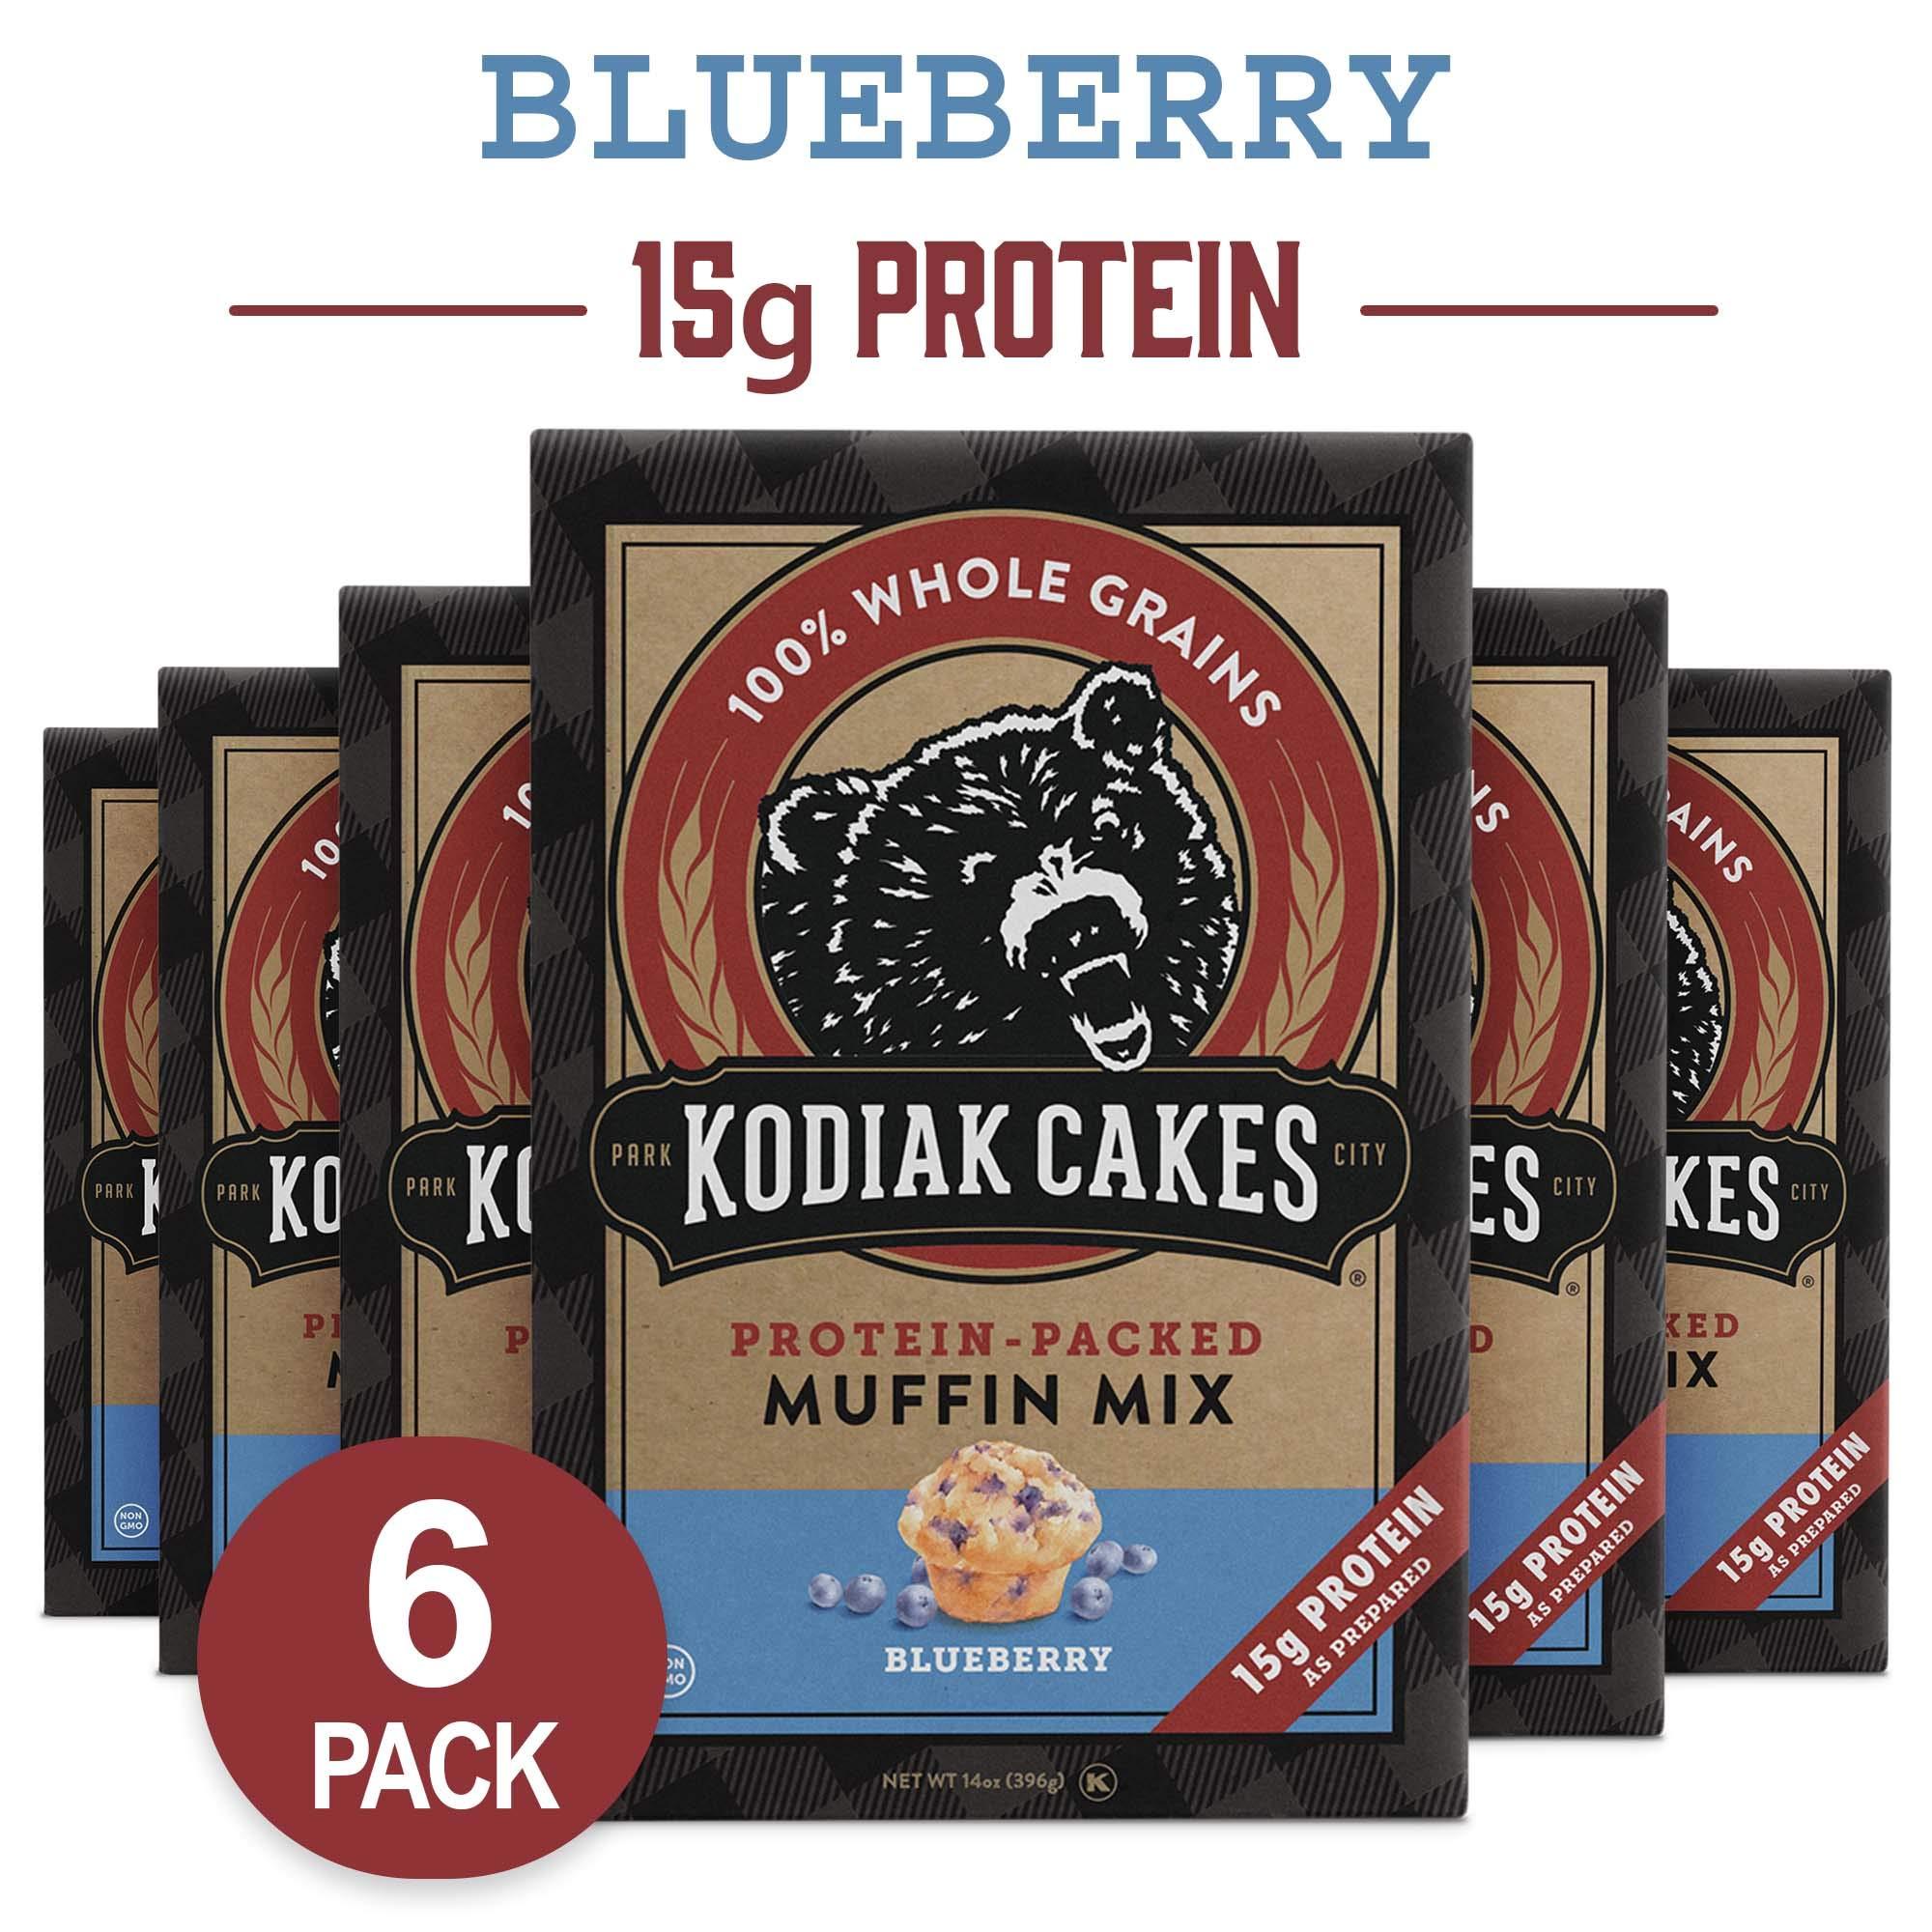 Kodiak Cakes Muffin Mix, Blueberry, 14 Ounce, Pack of 6 by Kodiak Cakes